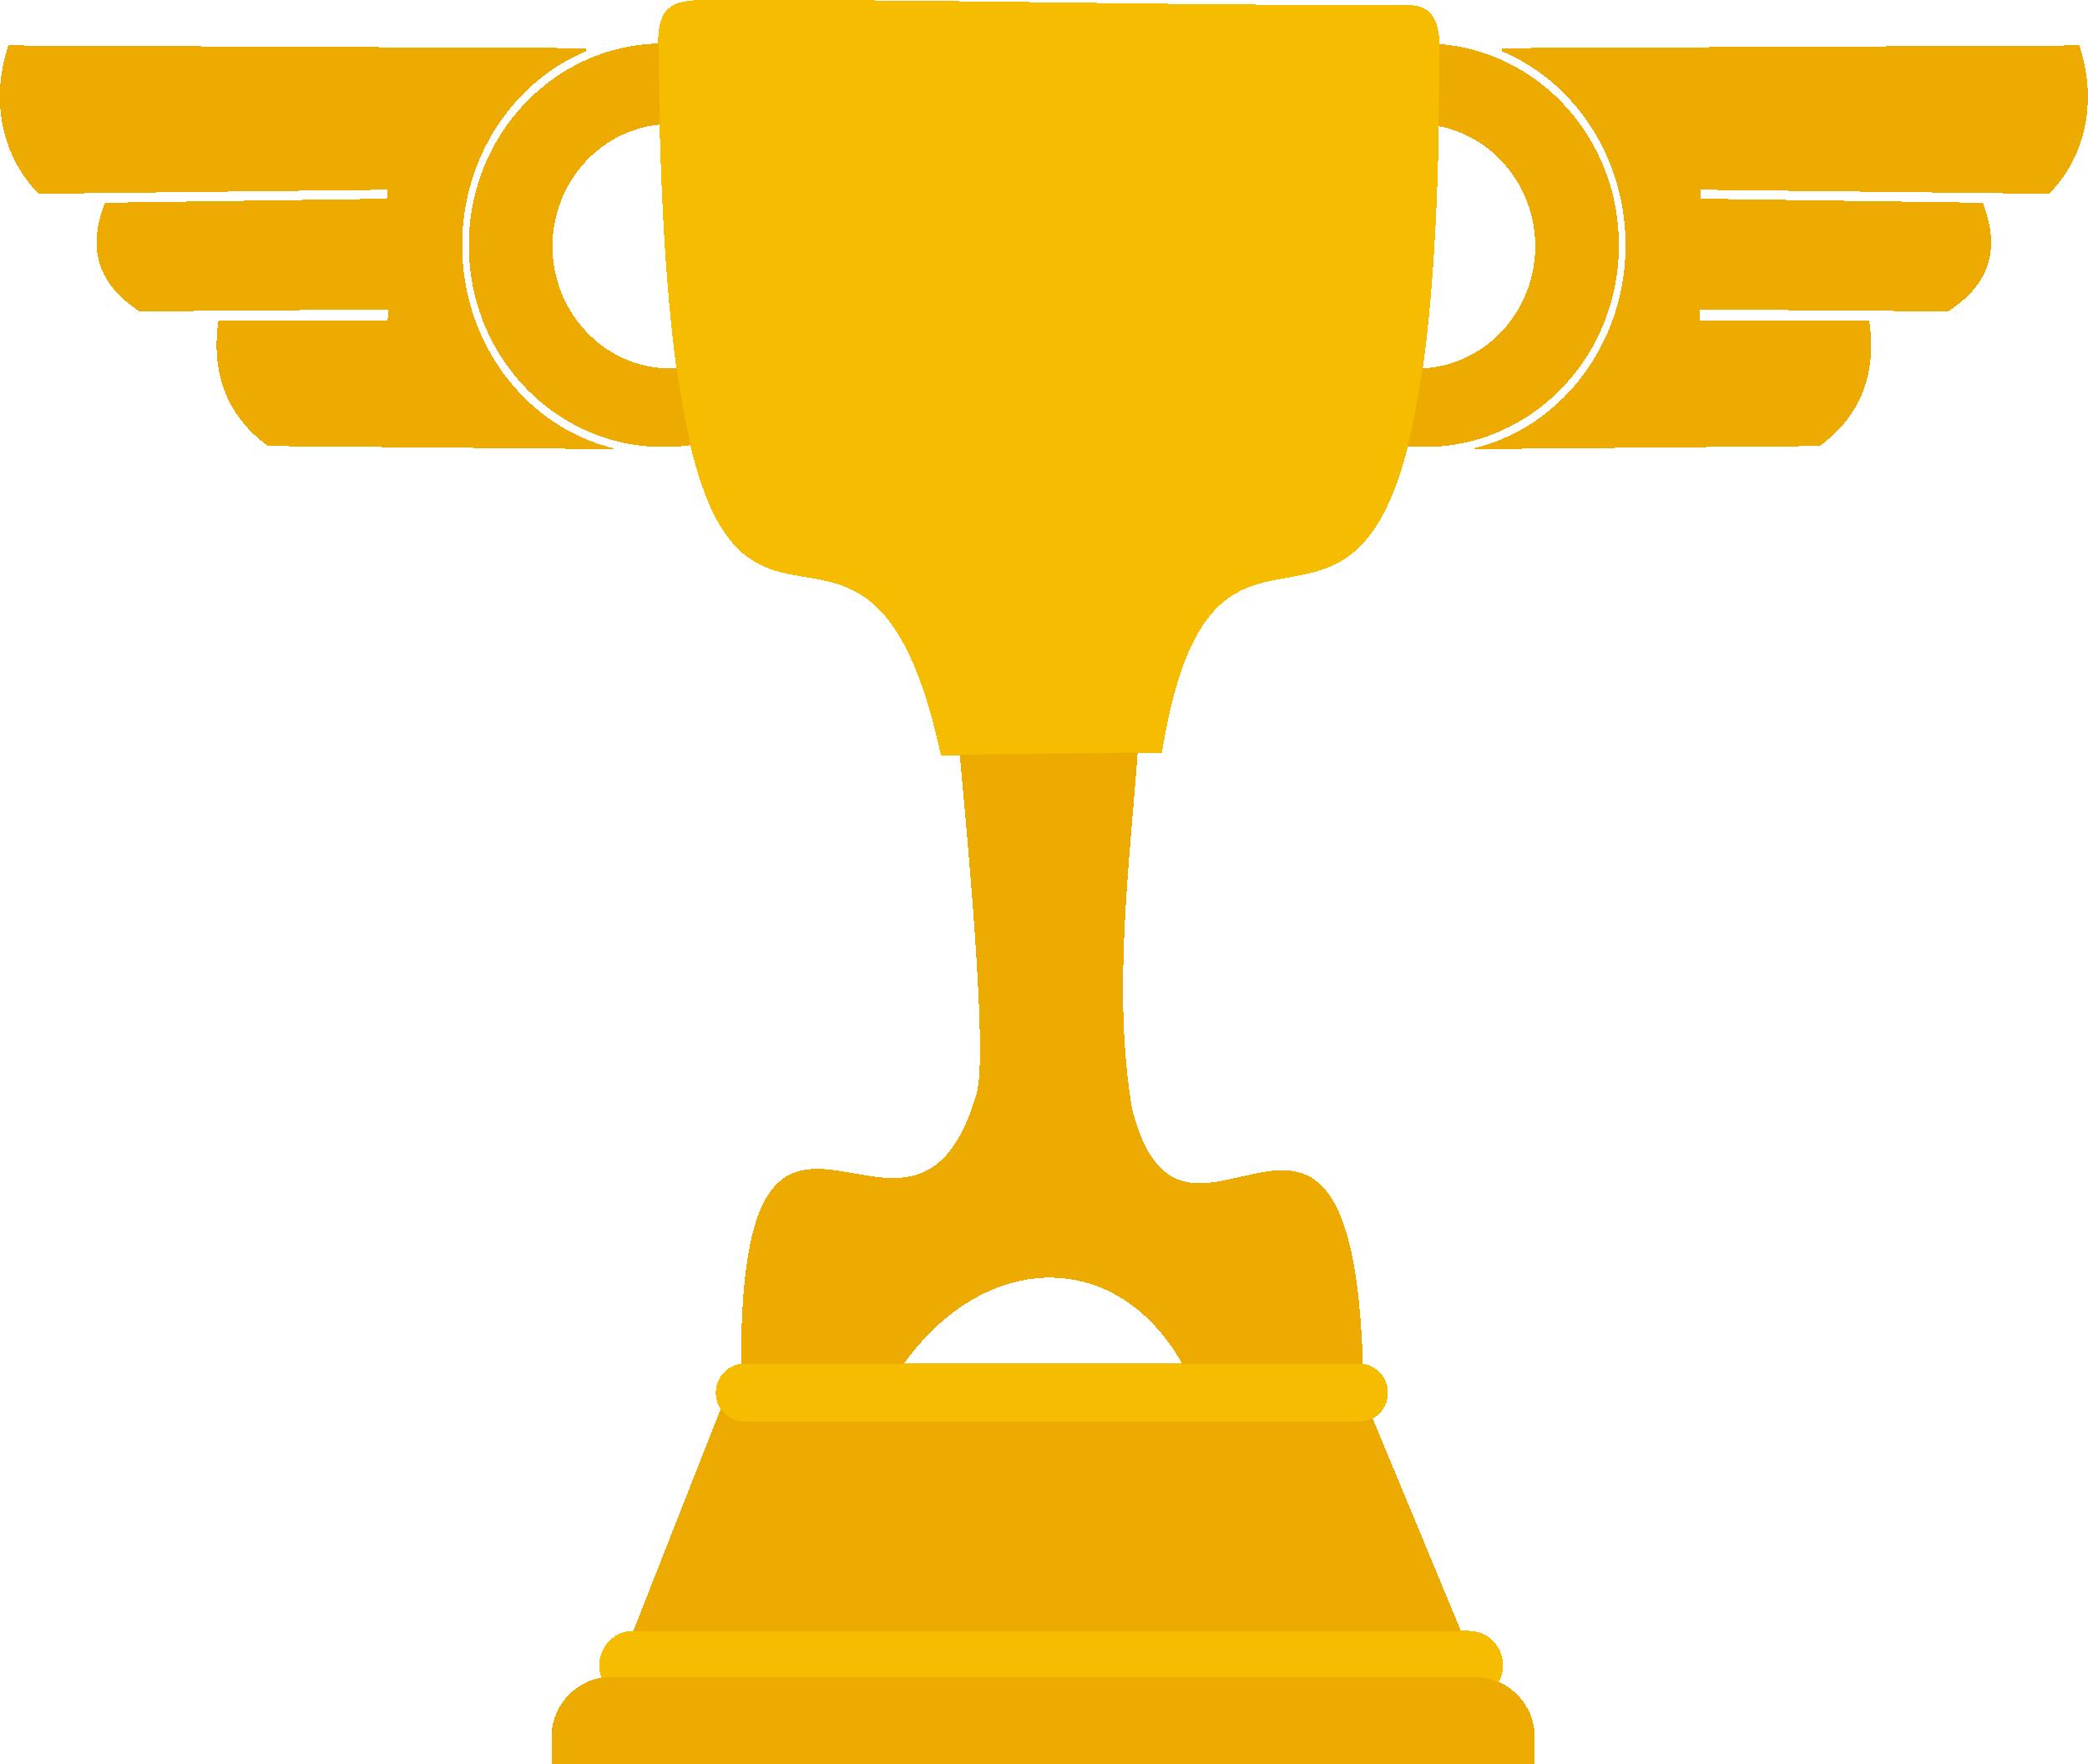 Hot Wheels clipart trophy (2501×2113) Printables Lightning png Birthdays